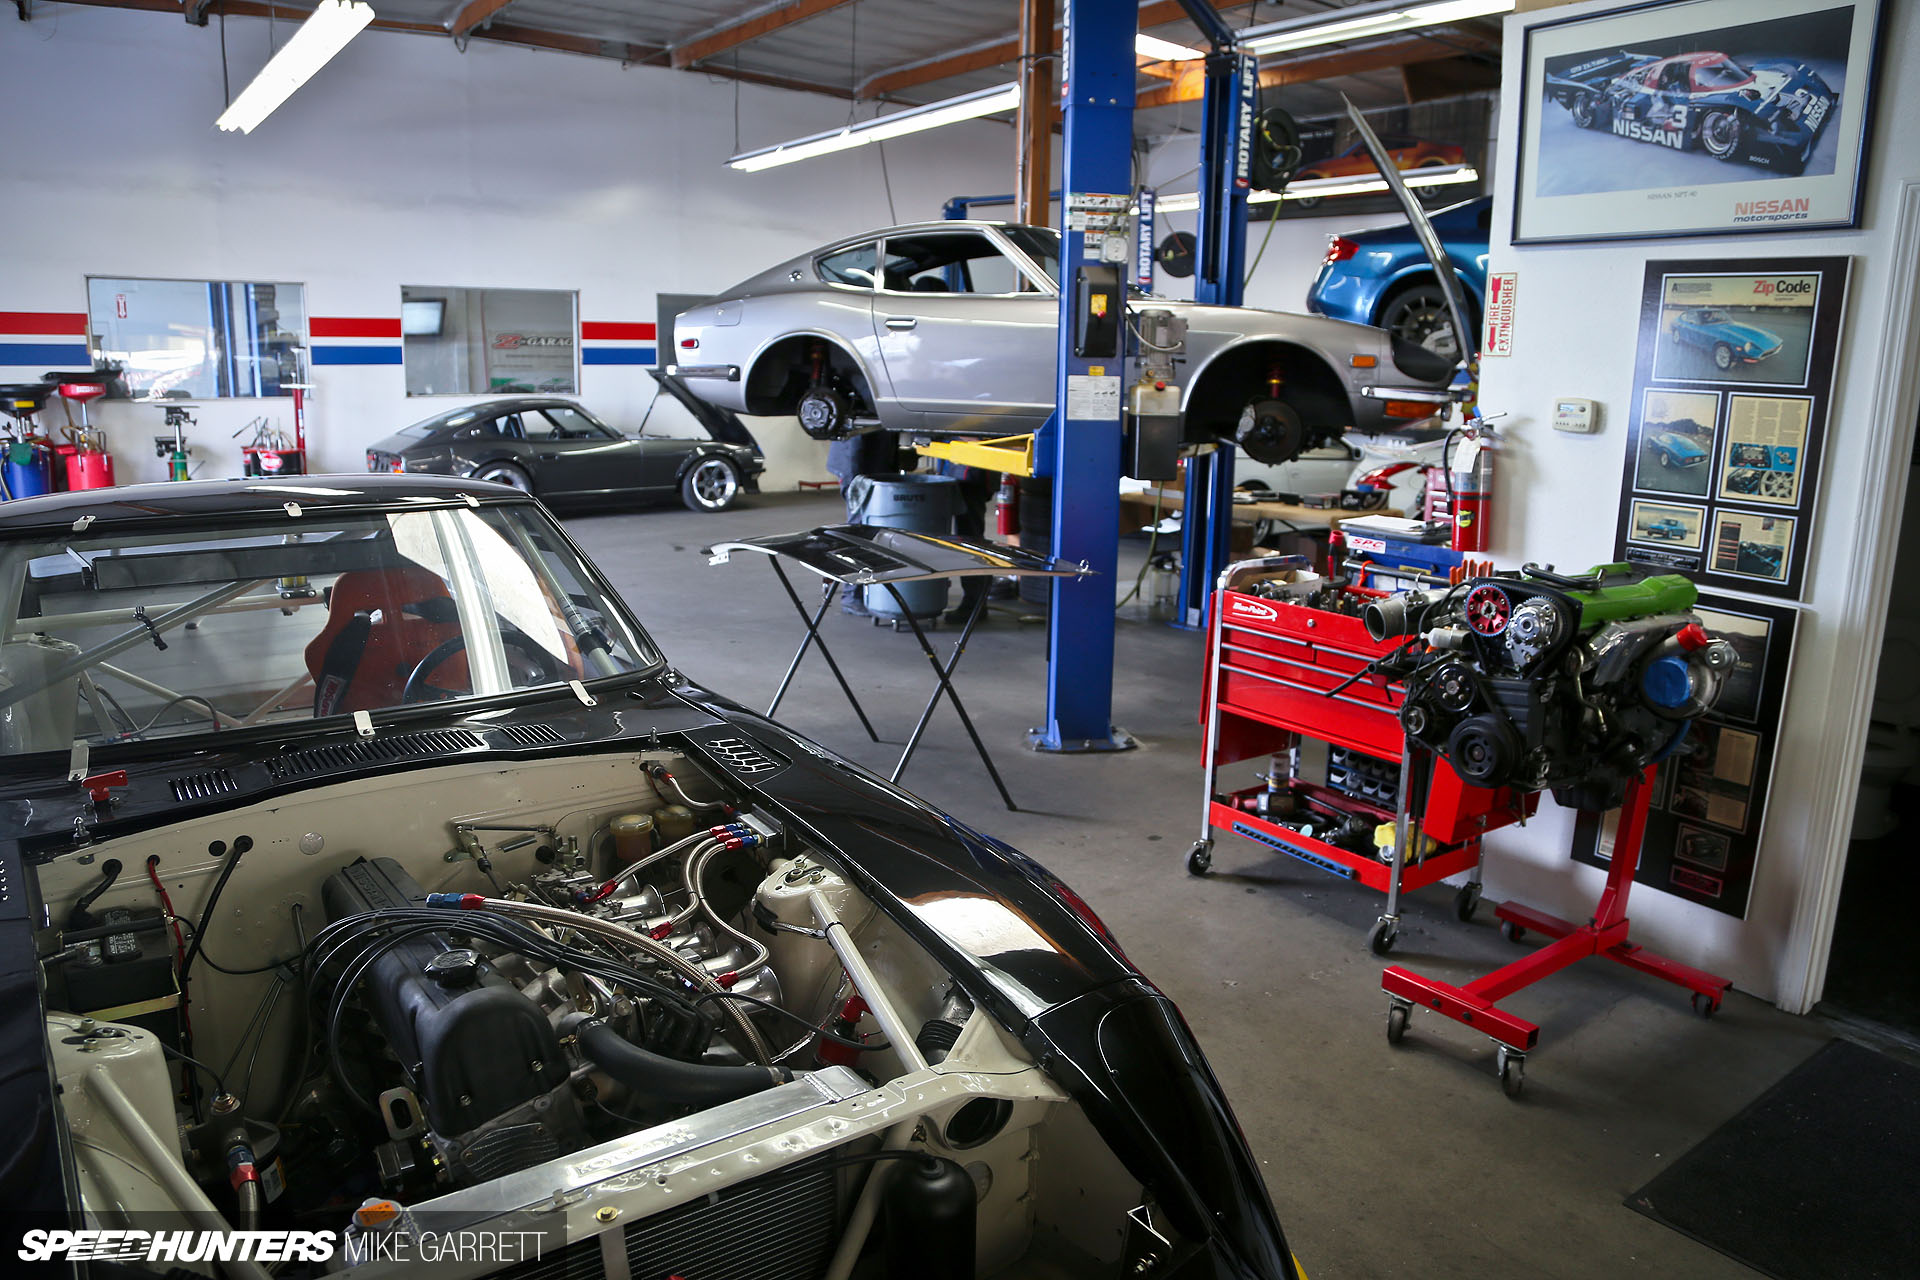 Z Car Garage: Where Datsun Geeks Rule